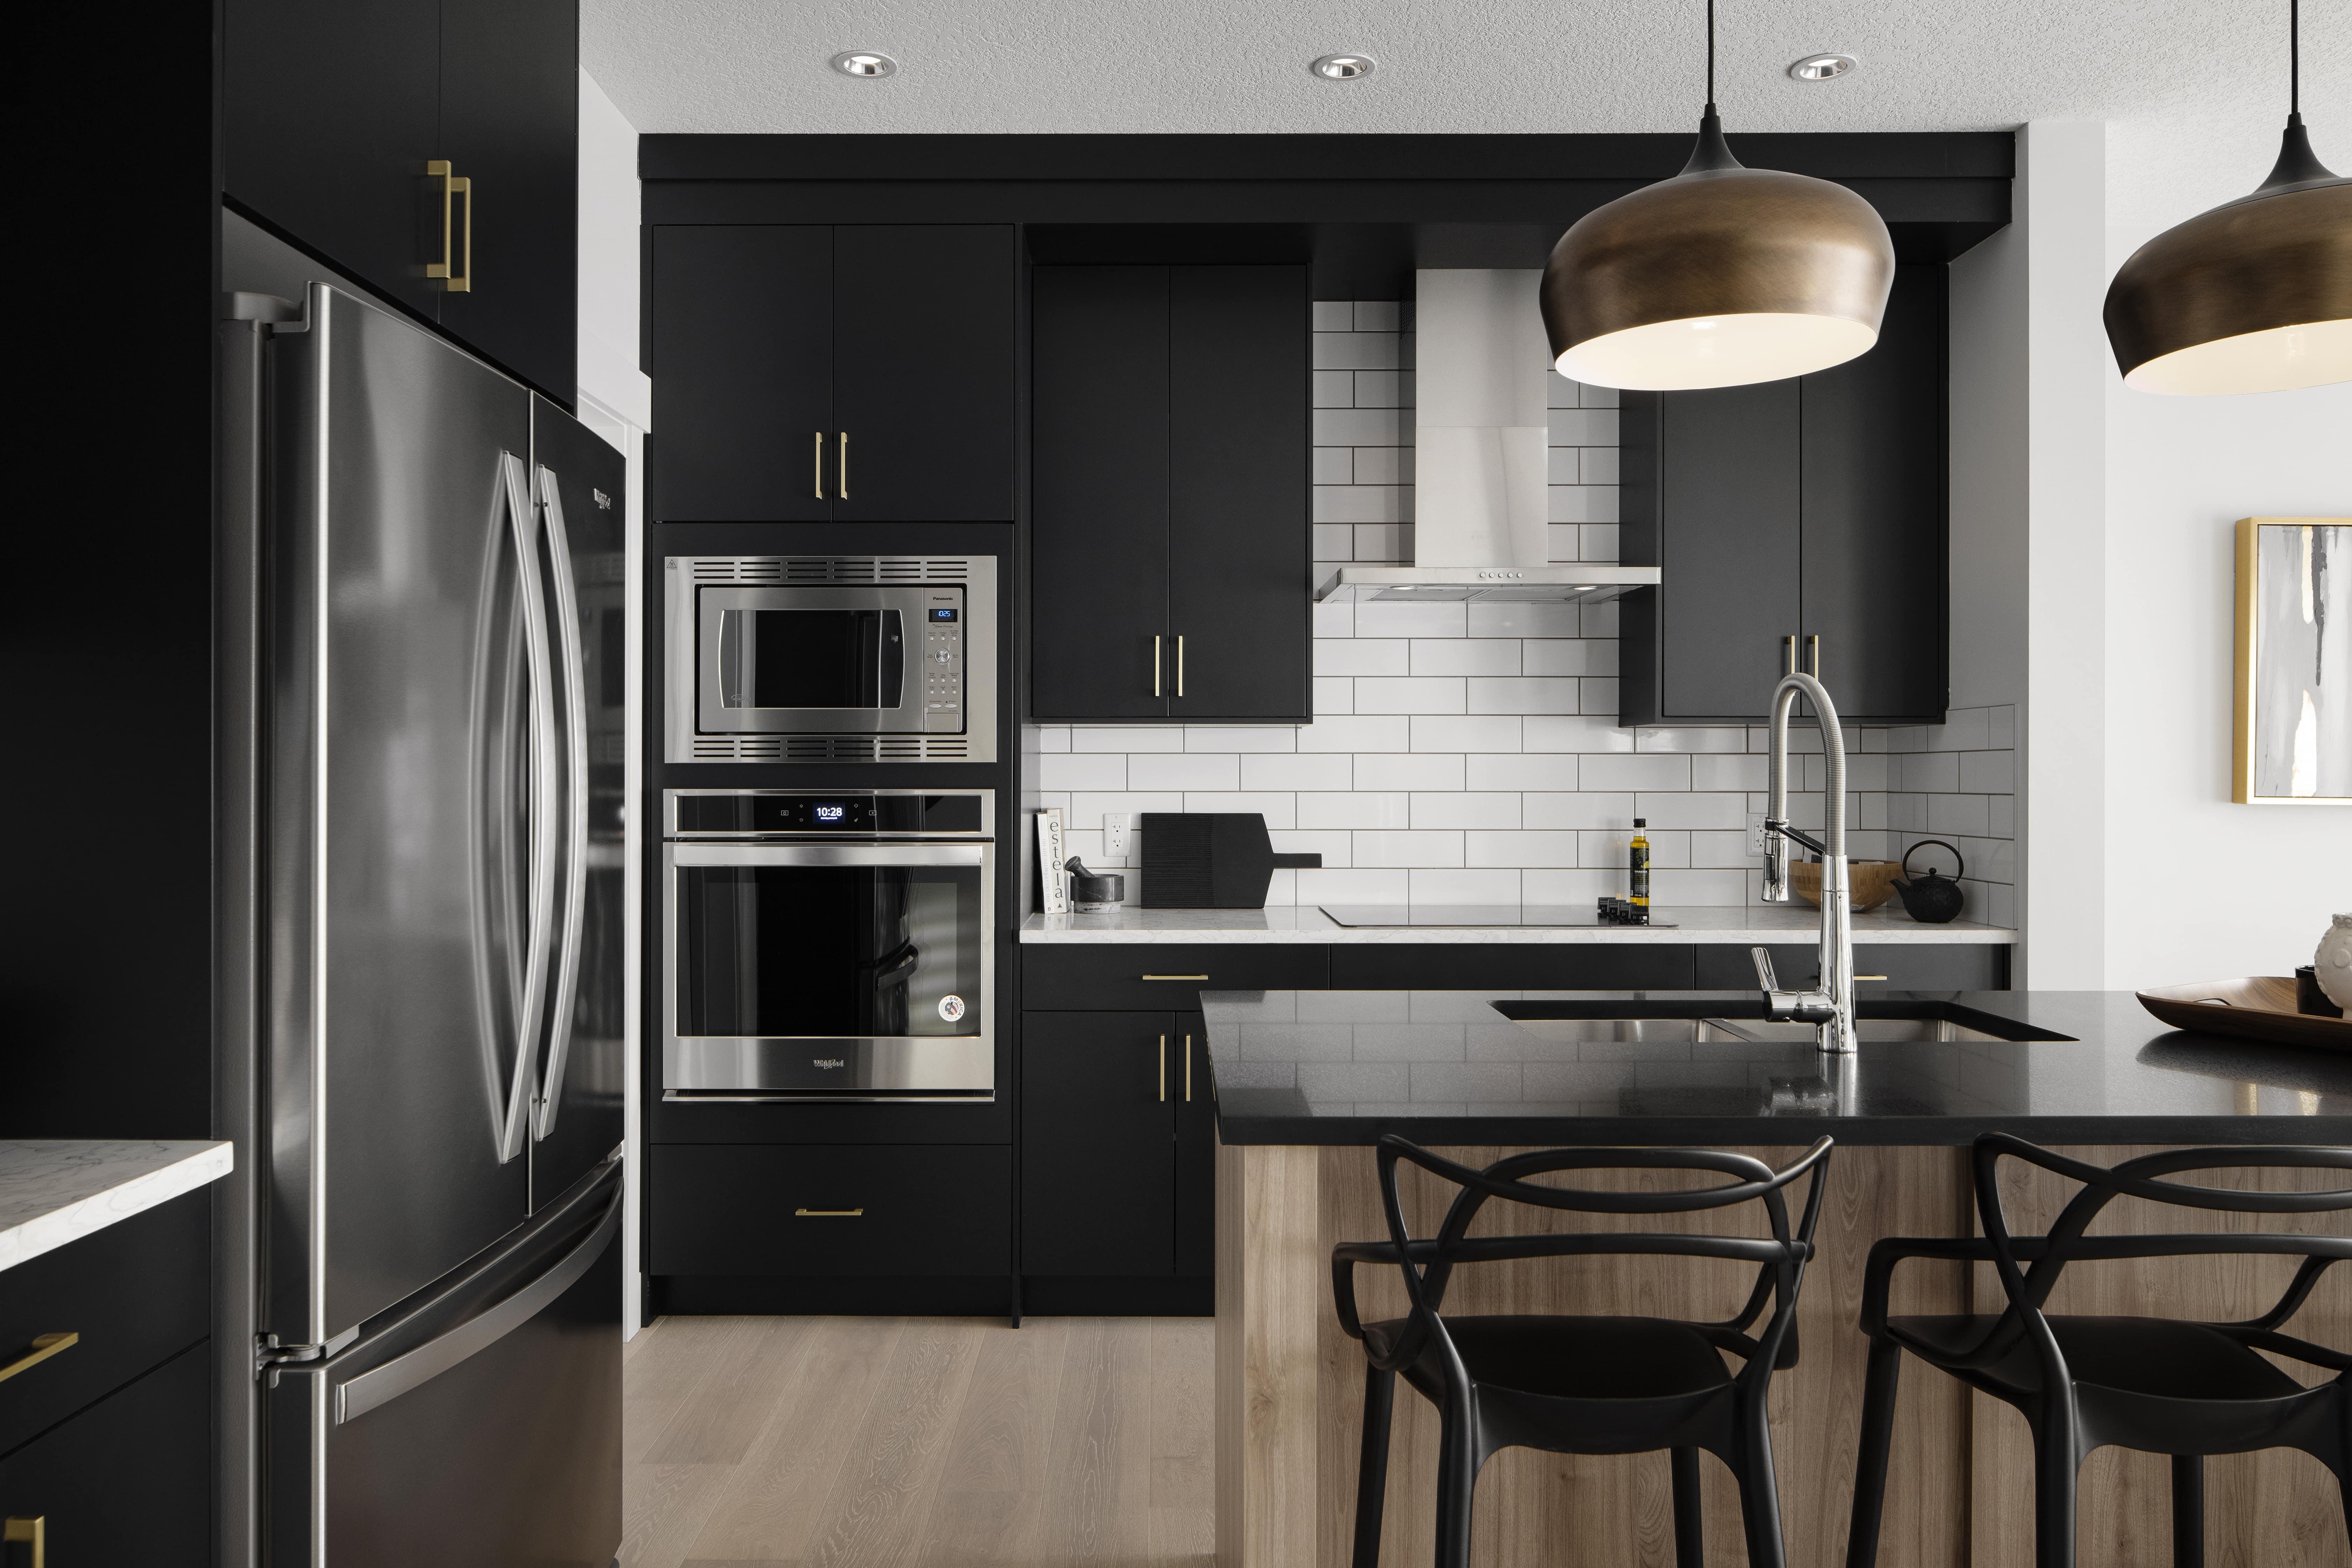 Luxuria_Homes_Builder_Calgary_Airdrie_Edmonton_Chestermere_Strathmore19-min